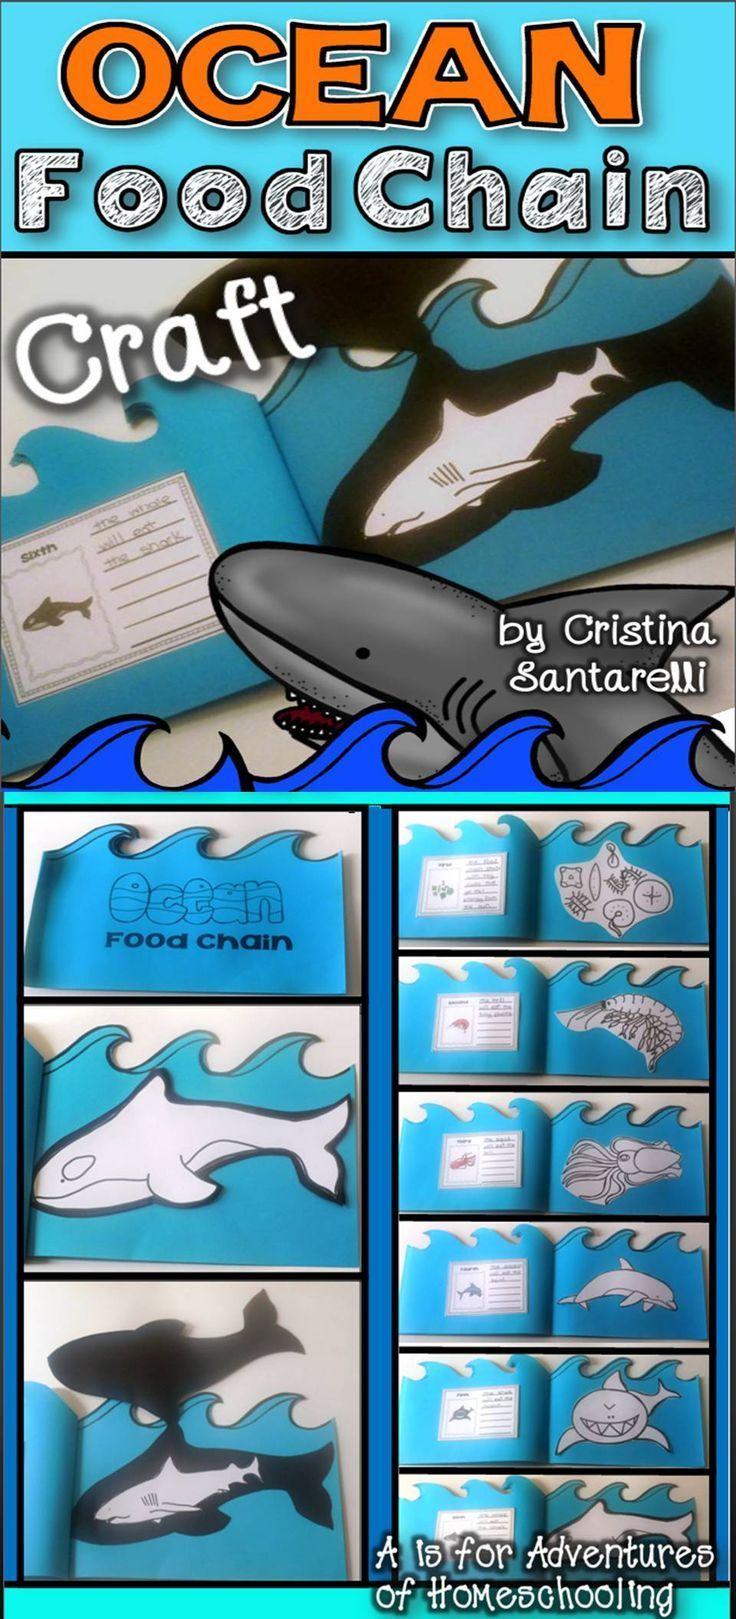 Ocean food chain Ocean food chain, Ocean food, Food